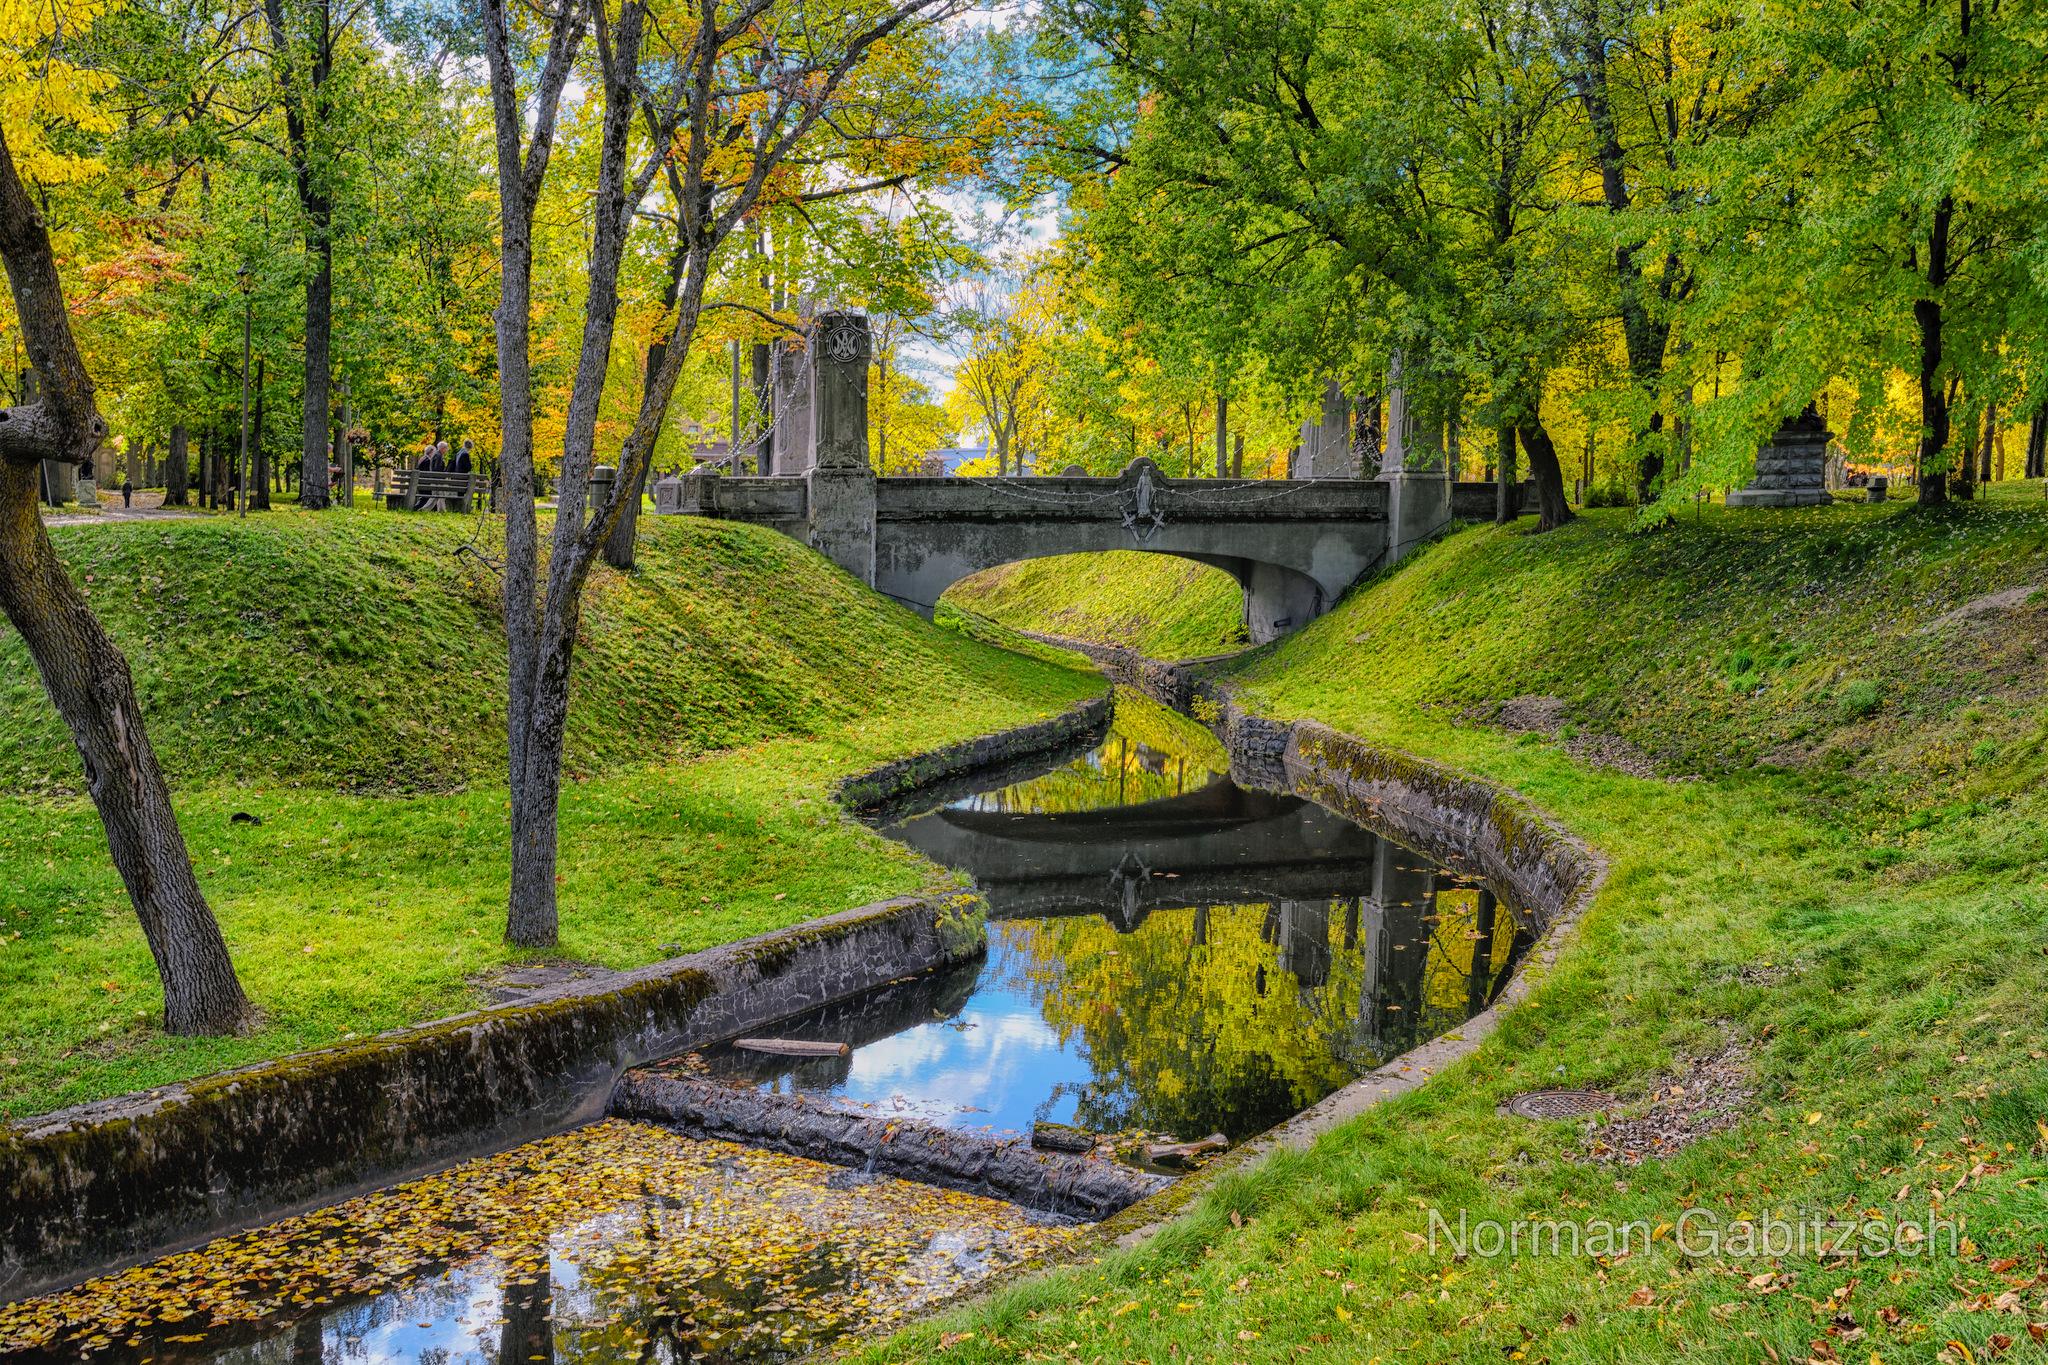 Photo in Travel #garden #trees #canada #water #autumn #norman gabitzsch #nikon #nikon d850 #nature #serene #photography #naturephotography #travel #outdoors #grass #travel photography #no people #green